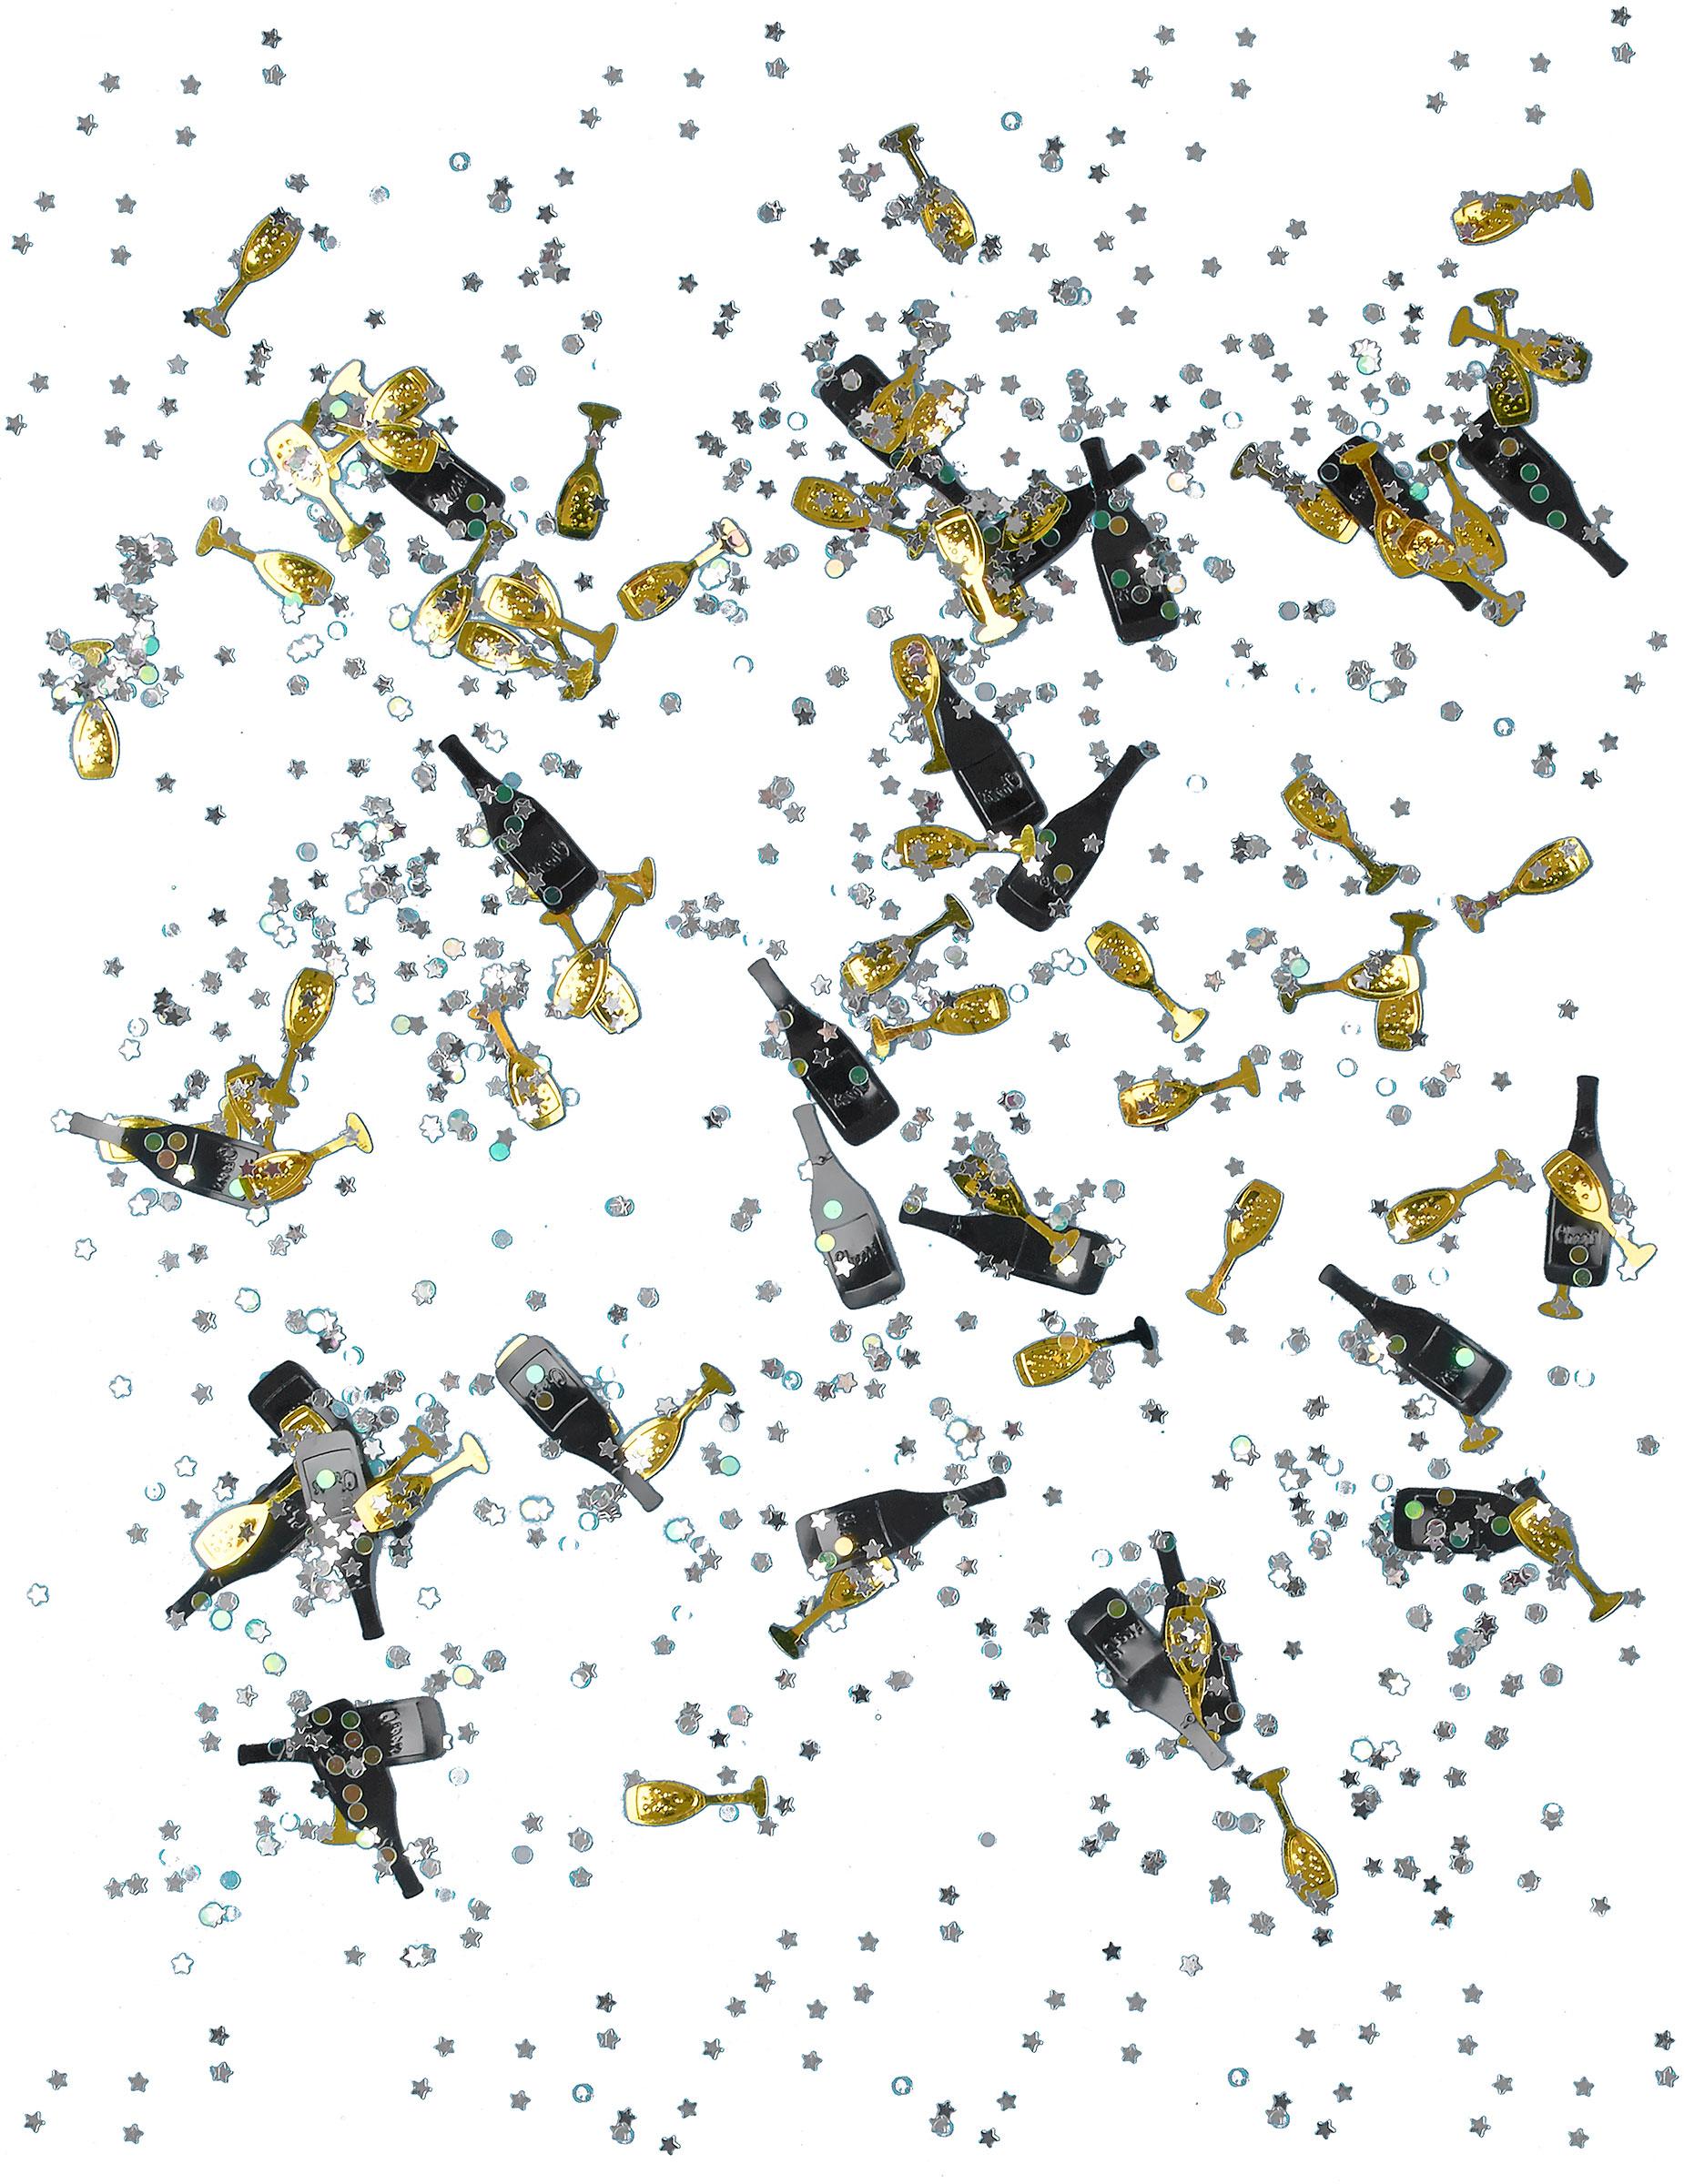 silvester konfetti cheers party deko schwarz gold 14g. Black Bedroom Furniture Sets. Home Design Ideas